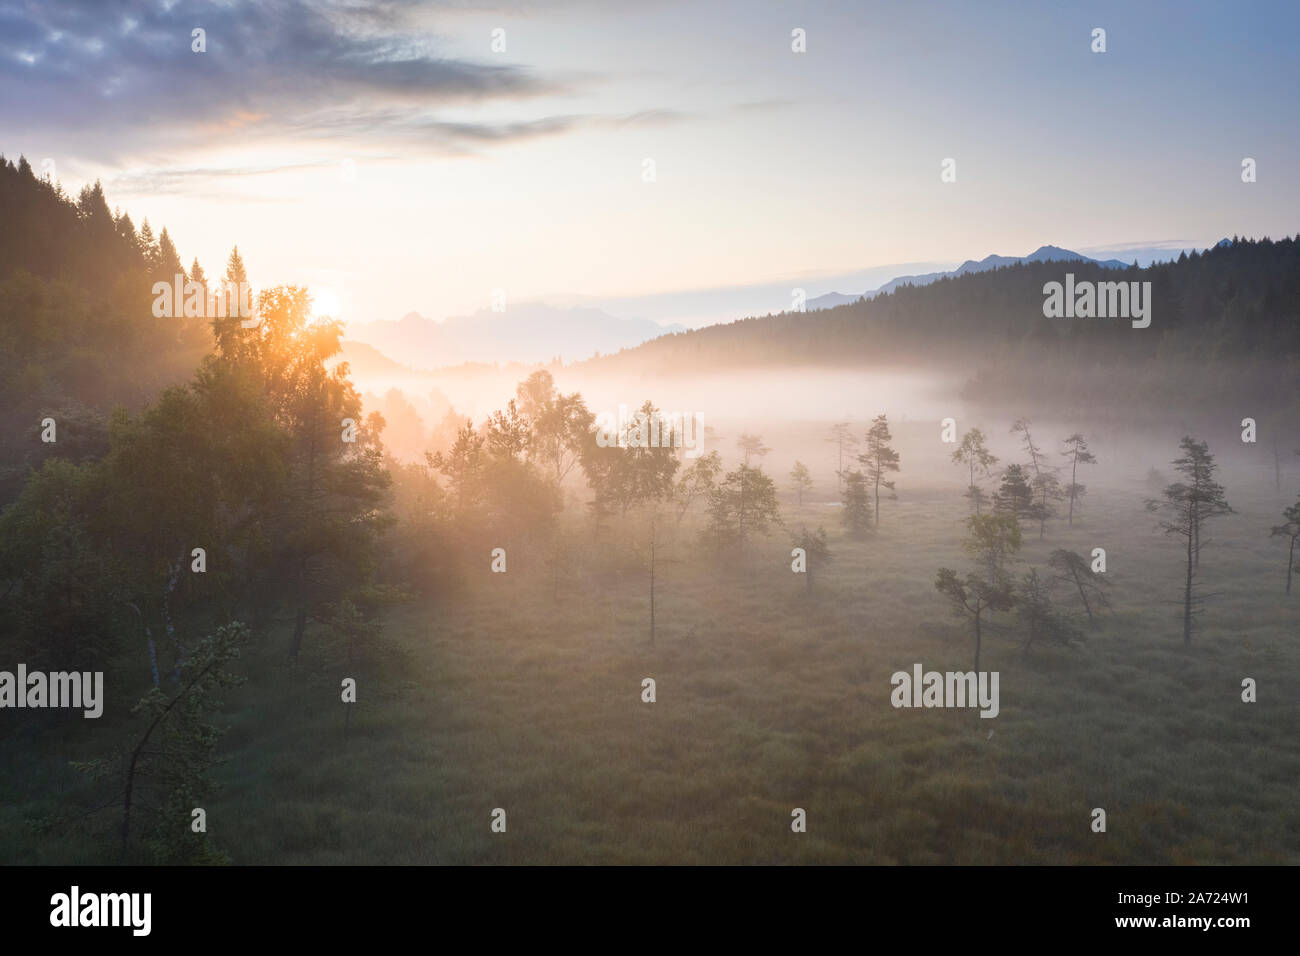 Rayos de sol al amanecer de la niebla que cubre el humedal de Pian di Gembro Reserva Natural, vista aérea, Aprica, Valtellina, Lombardía, Italia Foto de stock